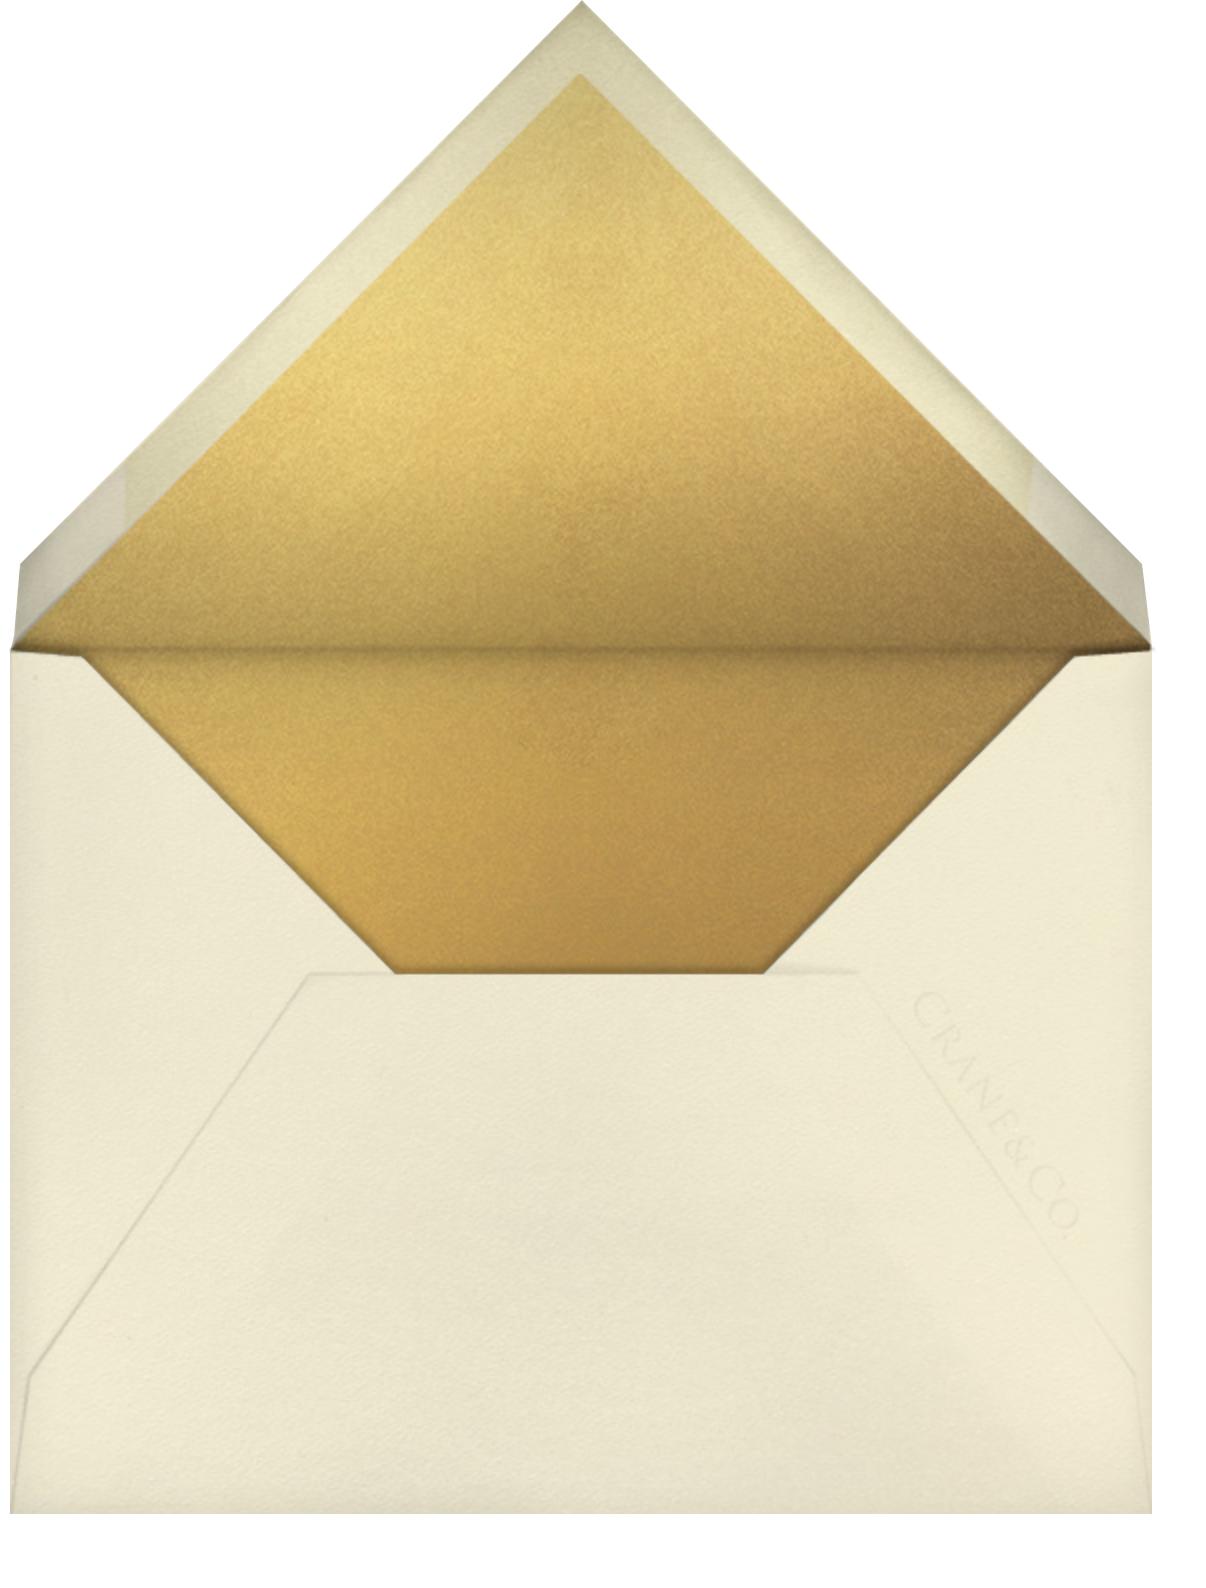 La Pavillion I (Save the Date) - Gold - kate spade new york - Party save the dates - envelope back